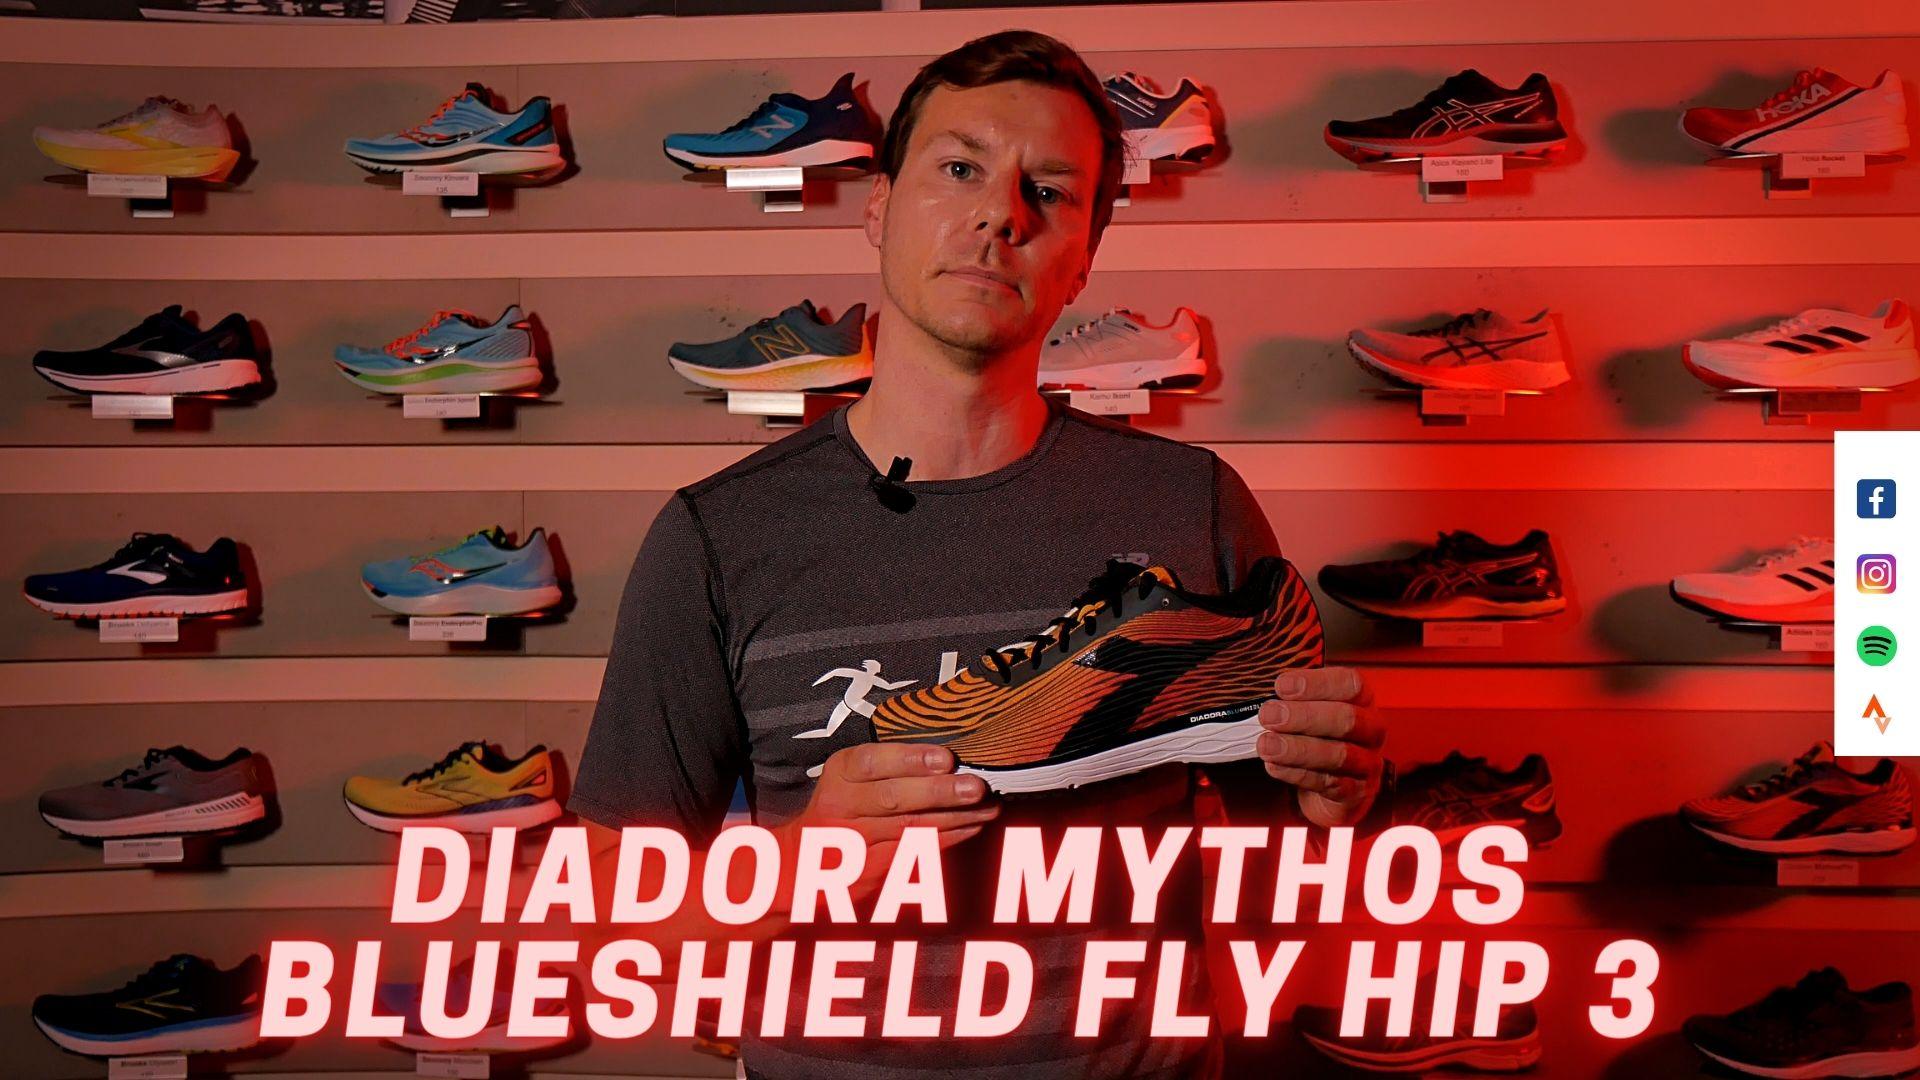 Laufschuh Test | DIADORA MYTHOS BLUESHIELD FLY HIP 3 | (German | Deutsch)